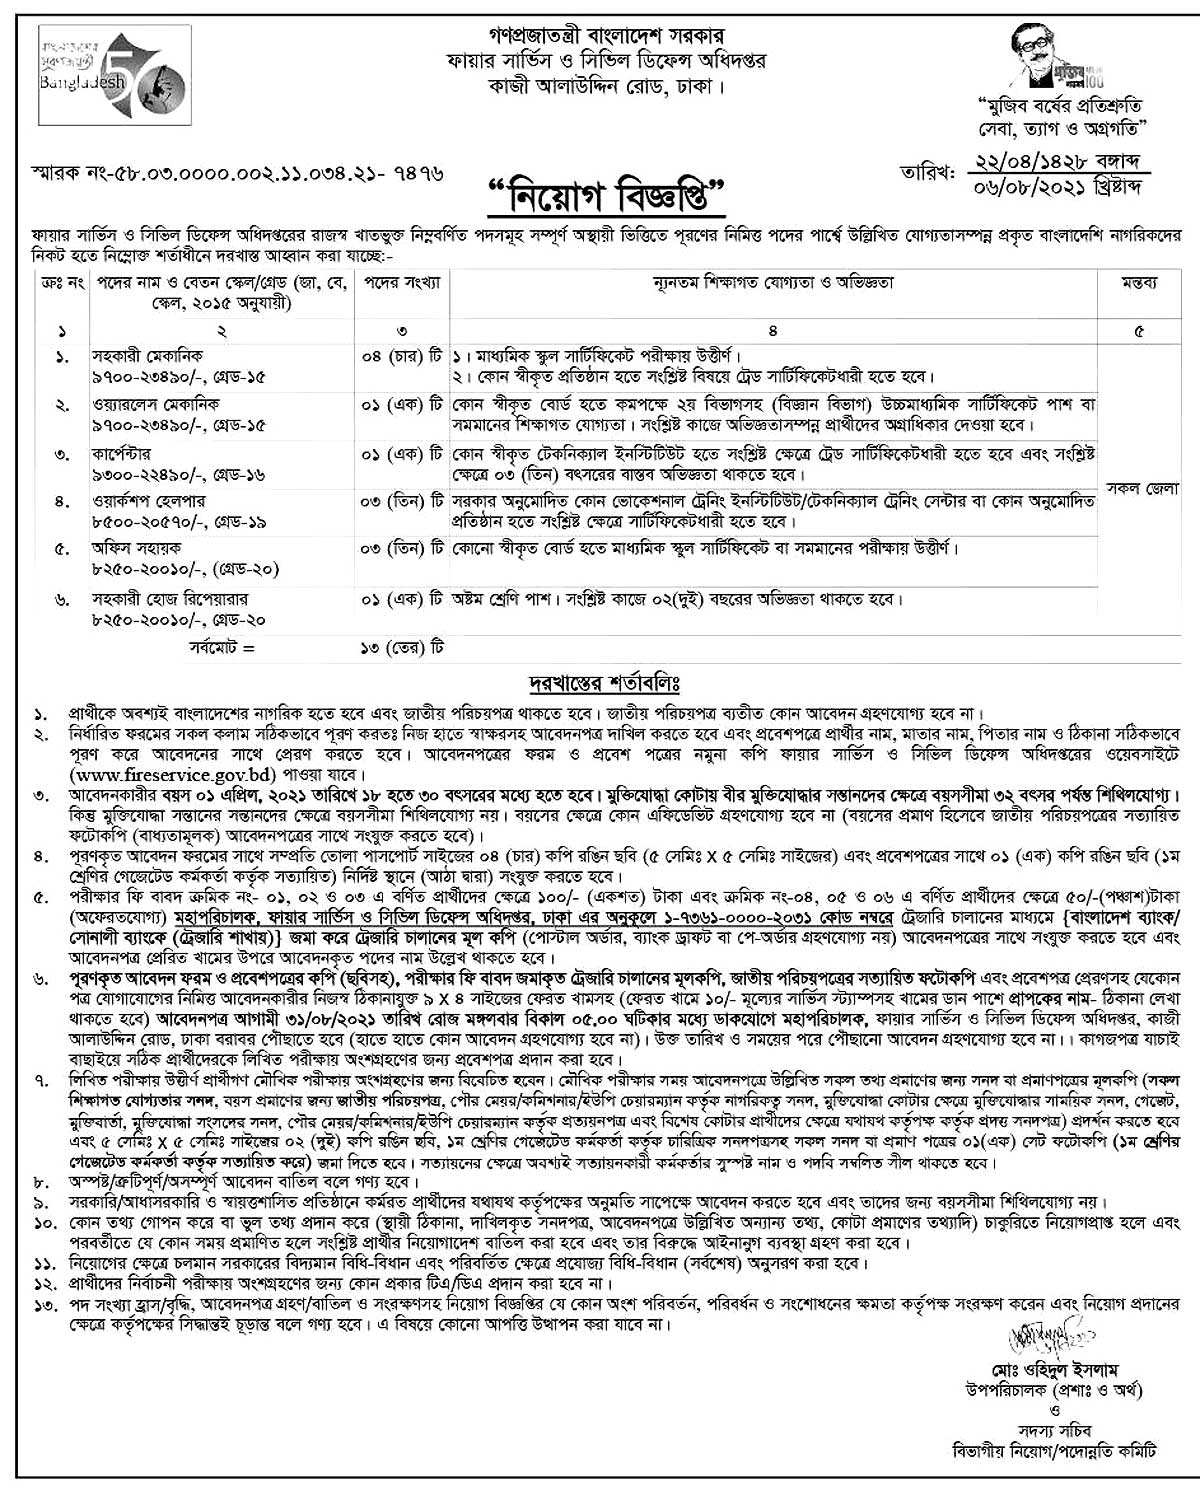 Fire Service Job Circular 2021